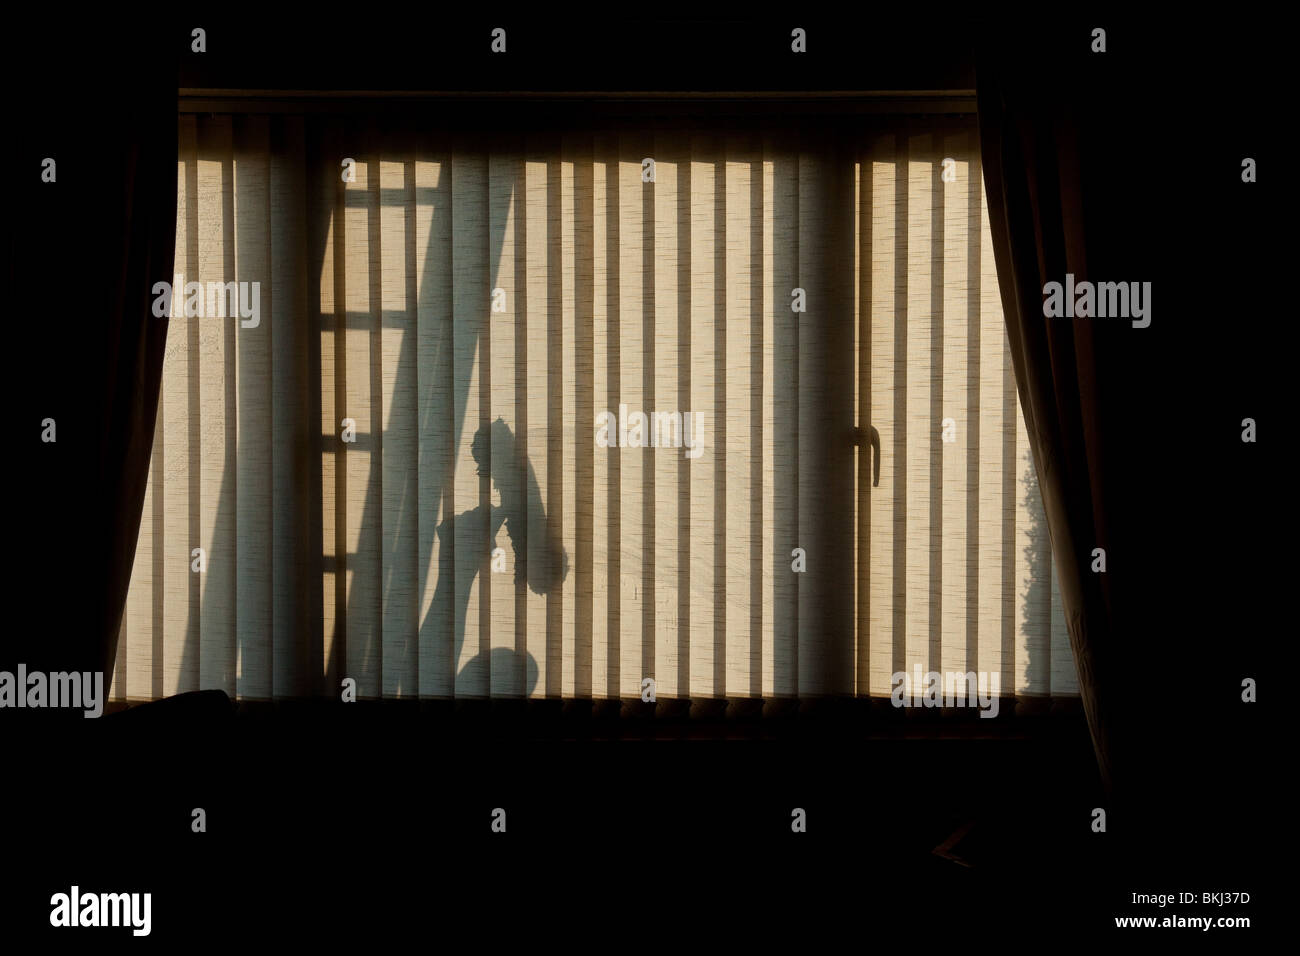 england wash stockfotos england wash bilder alamy. Black Bedroom Furniture Sets. Home Design Ideas